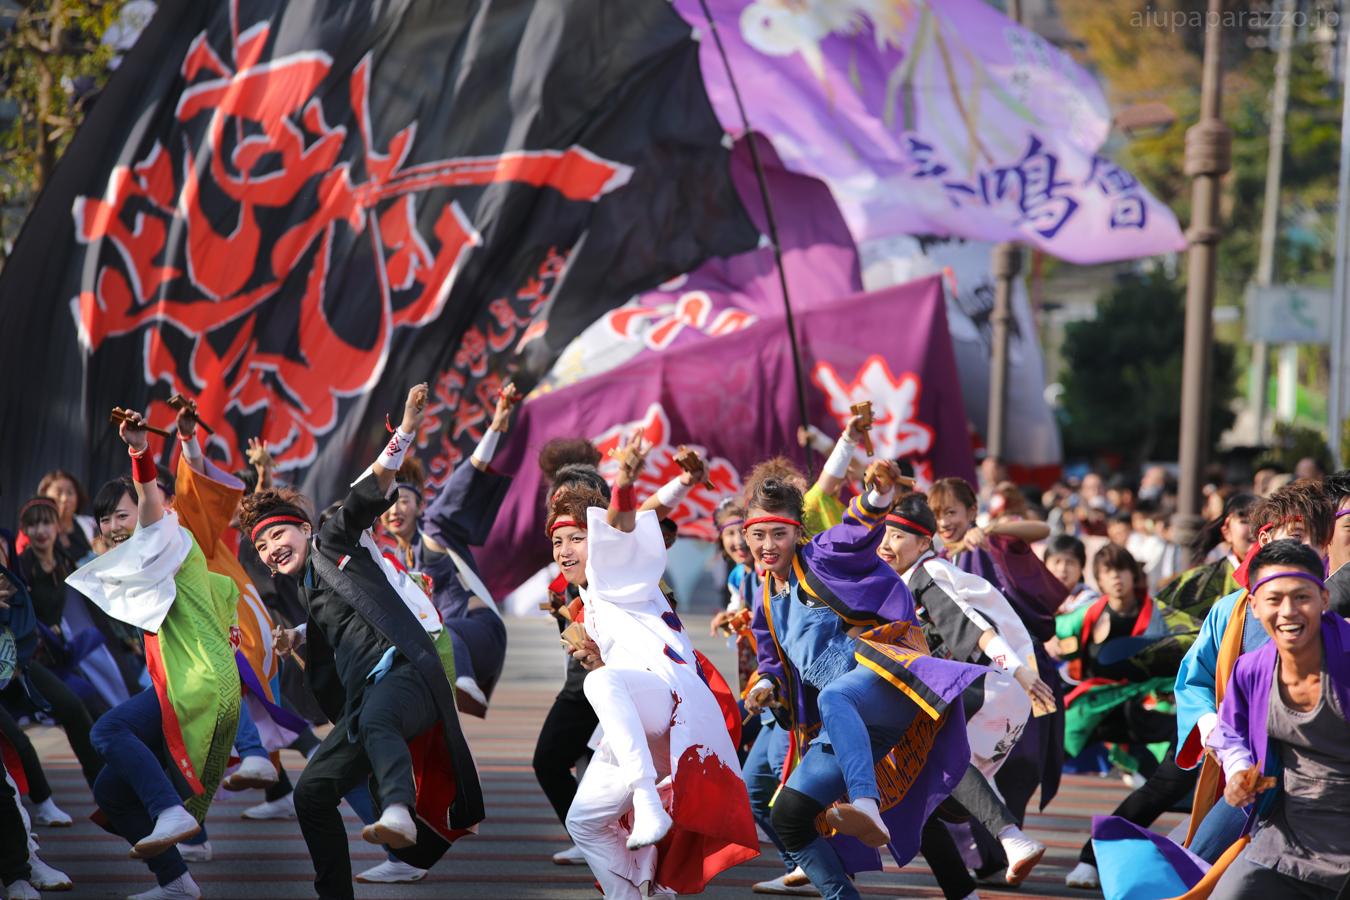 kanpachi2016oyachai-29.jpg